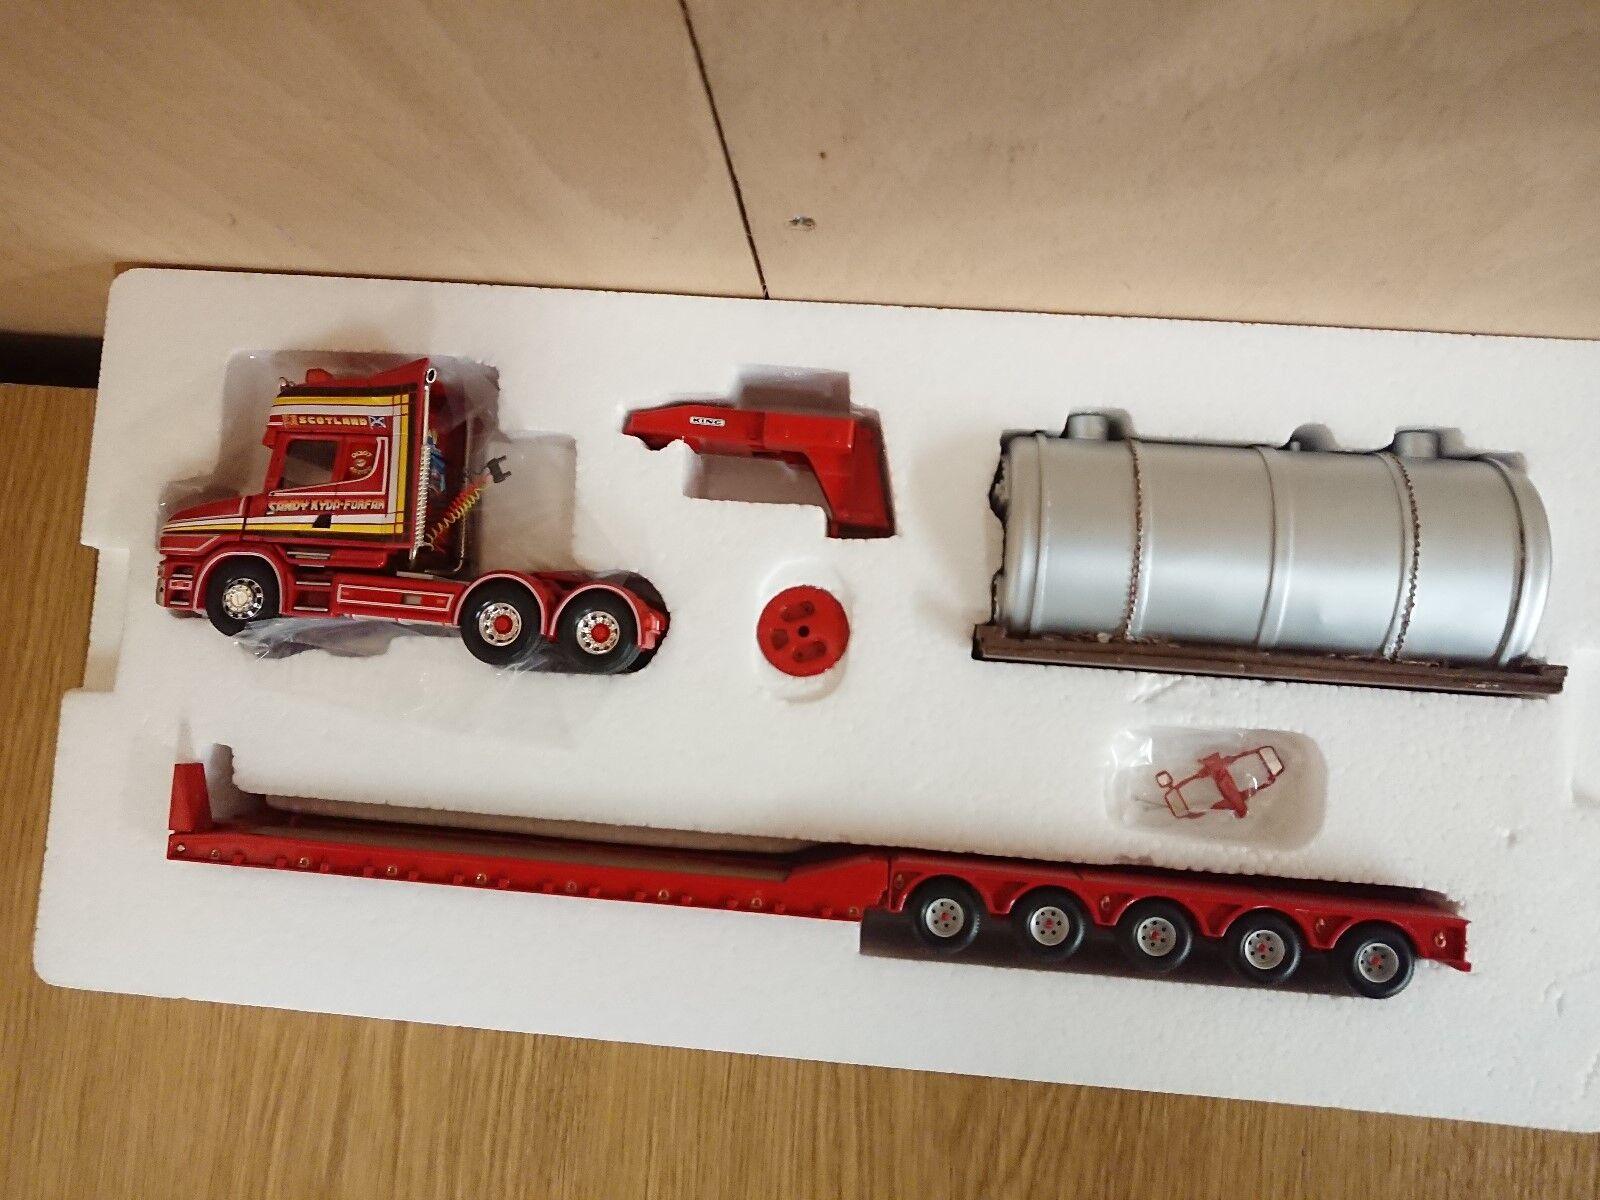 CORGI CC12810 Heavy Haul SCANIA T5 Essieu King Trailer & Boiler LTD ED 0002 of2600